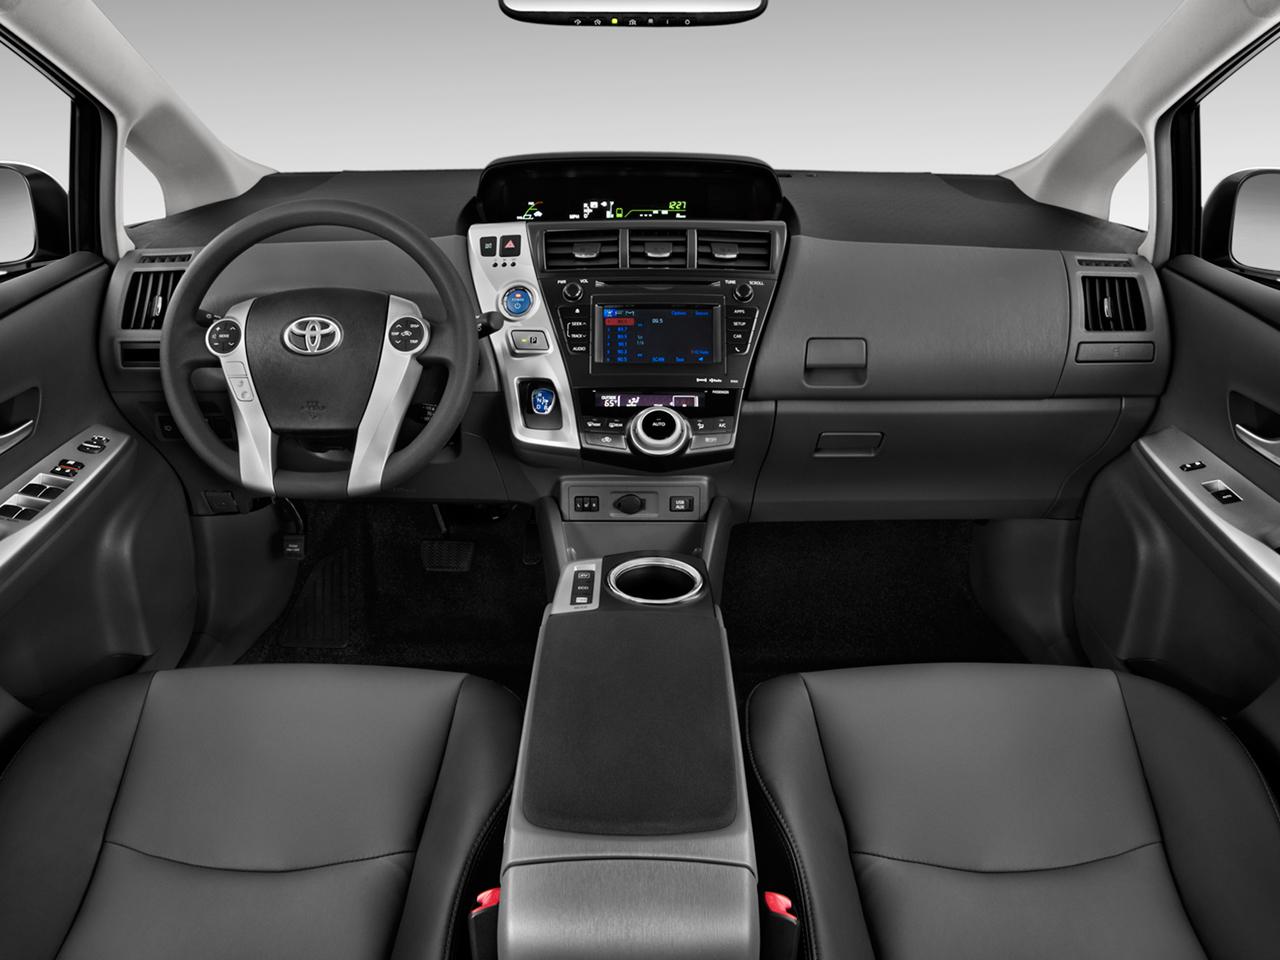 2012 Toyota Prius V Cckpit